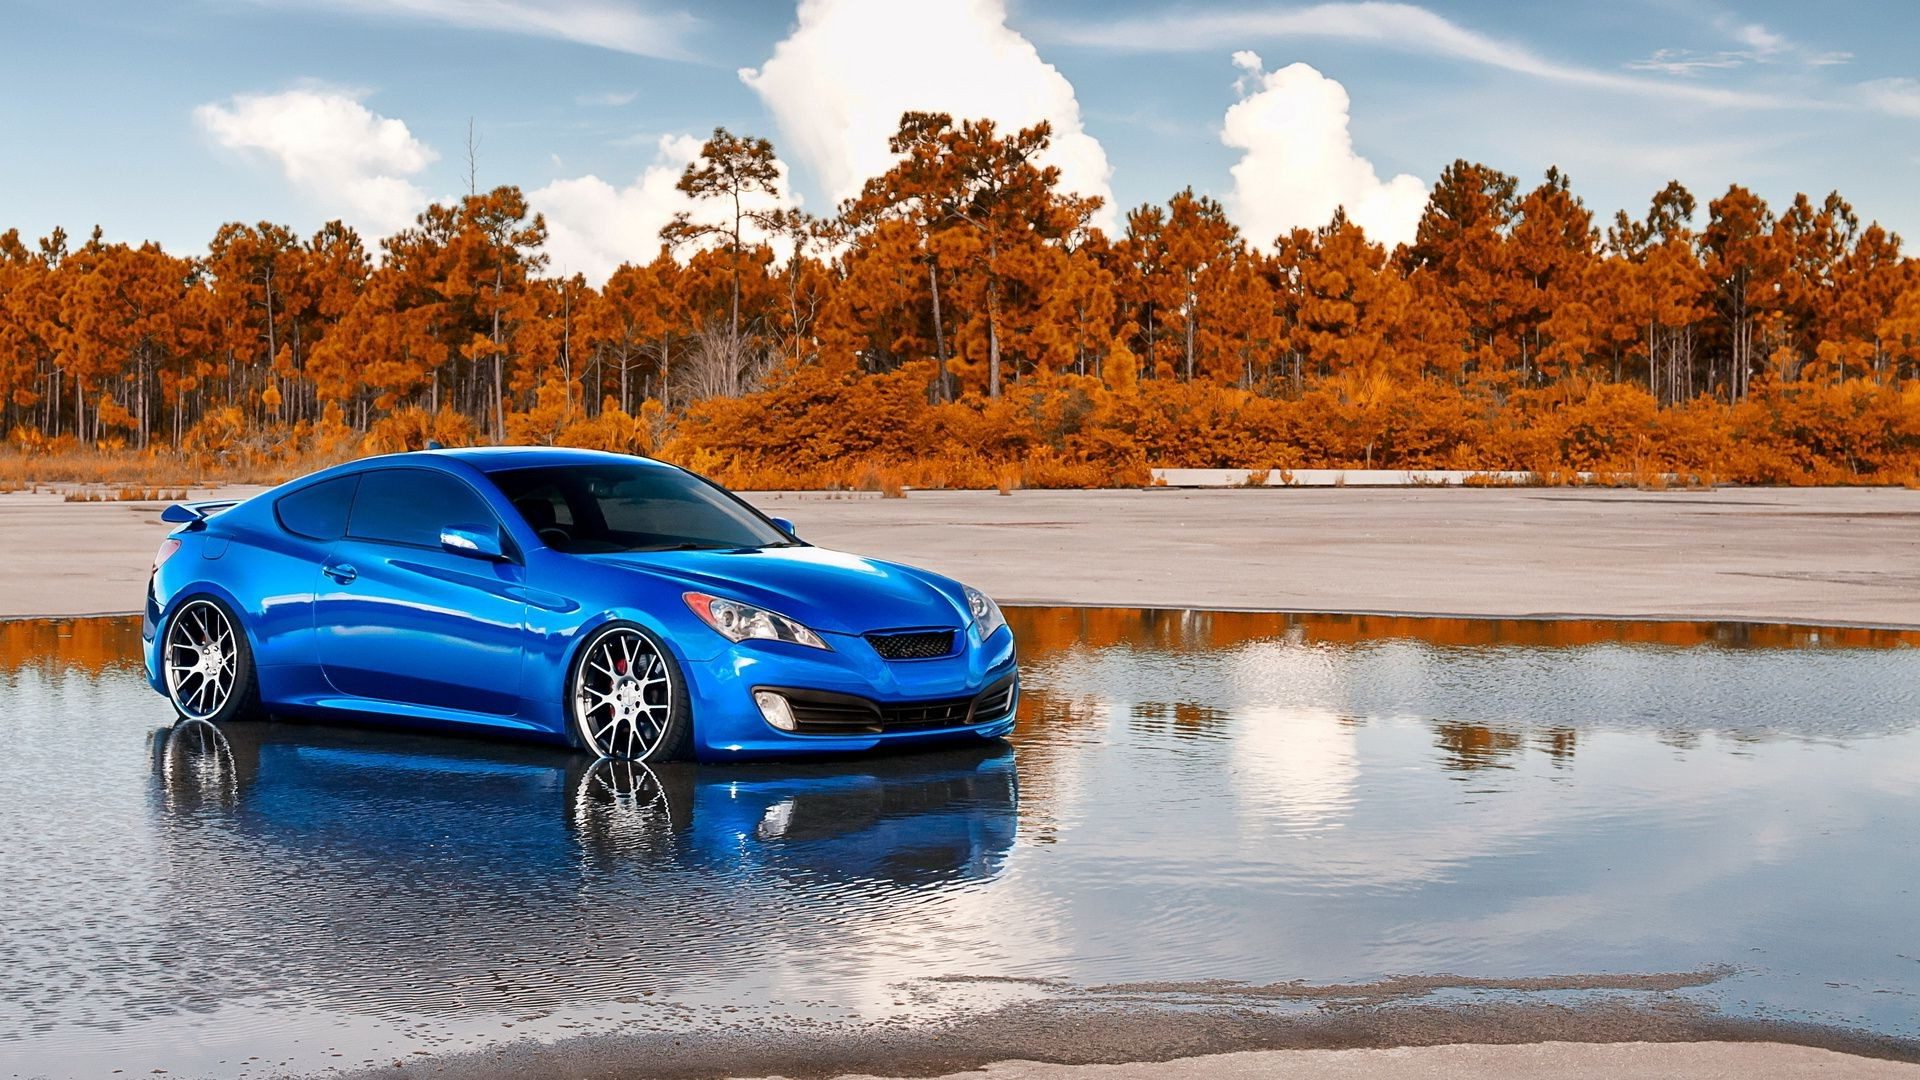 спортивный автомобиль синий  № 3301856 без смс